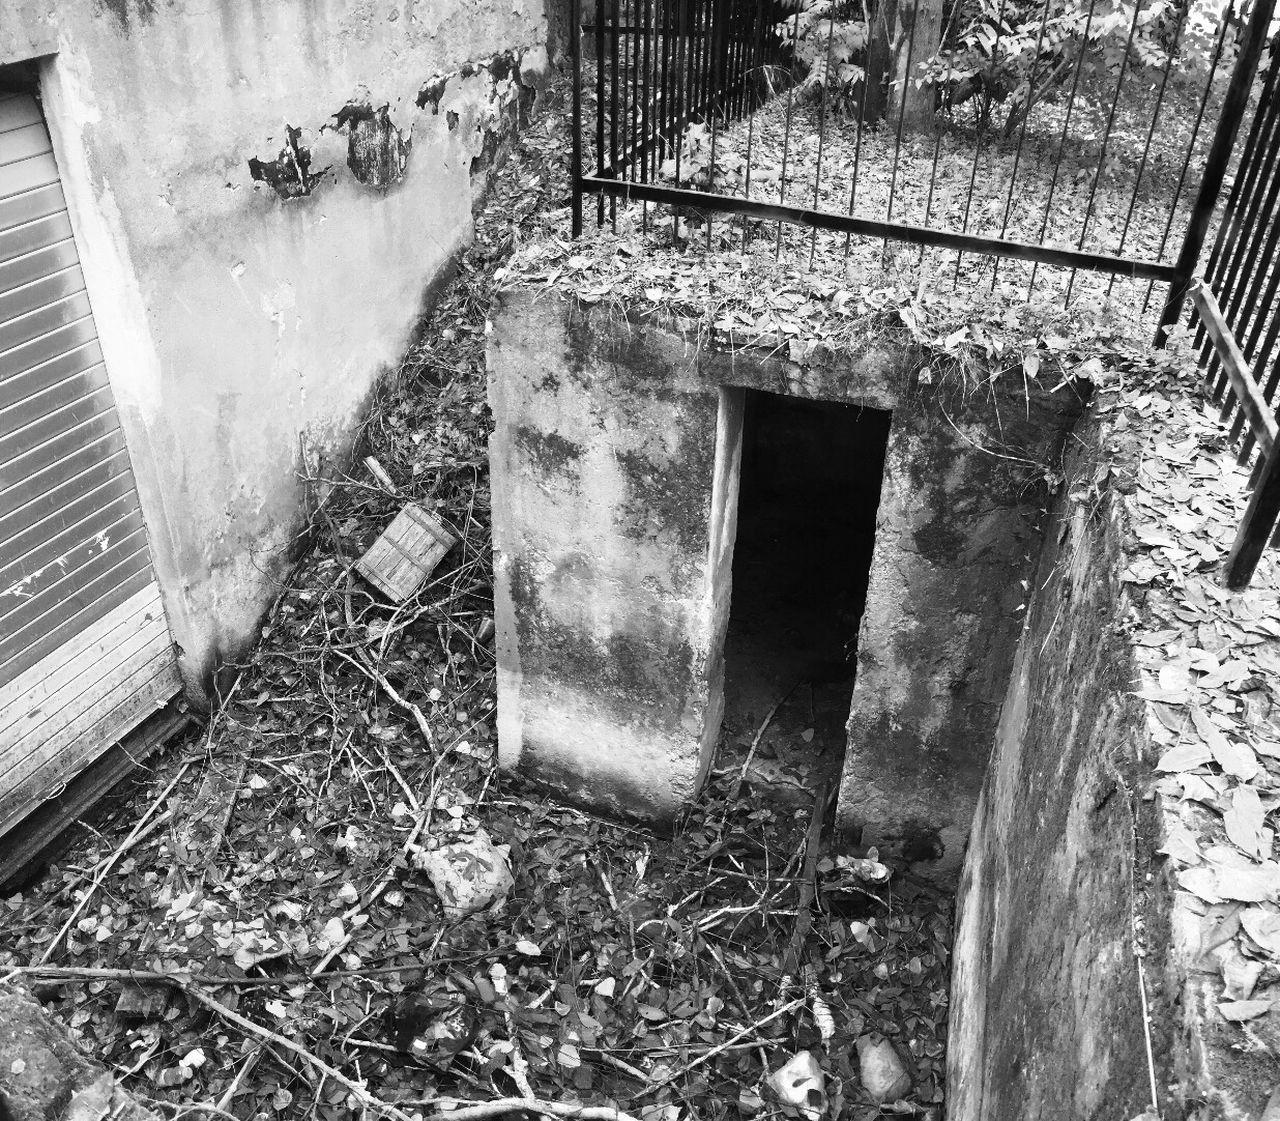 architecture, abandoned, built structure, building exterior, damaged, door, no people, window, day, house, weathered, outdoors, doorway, run-down, bad condition, destruction, open door